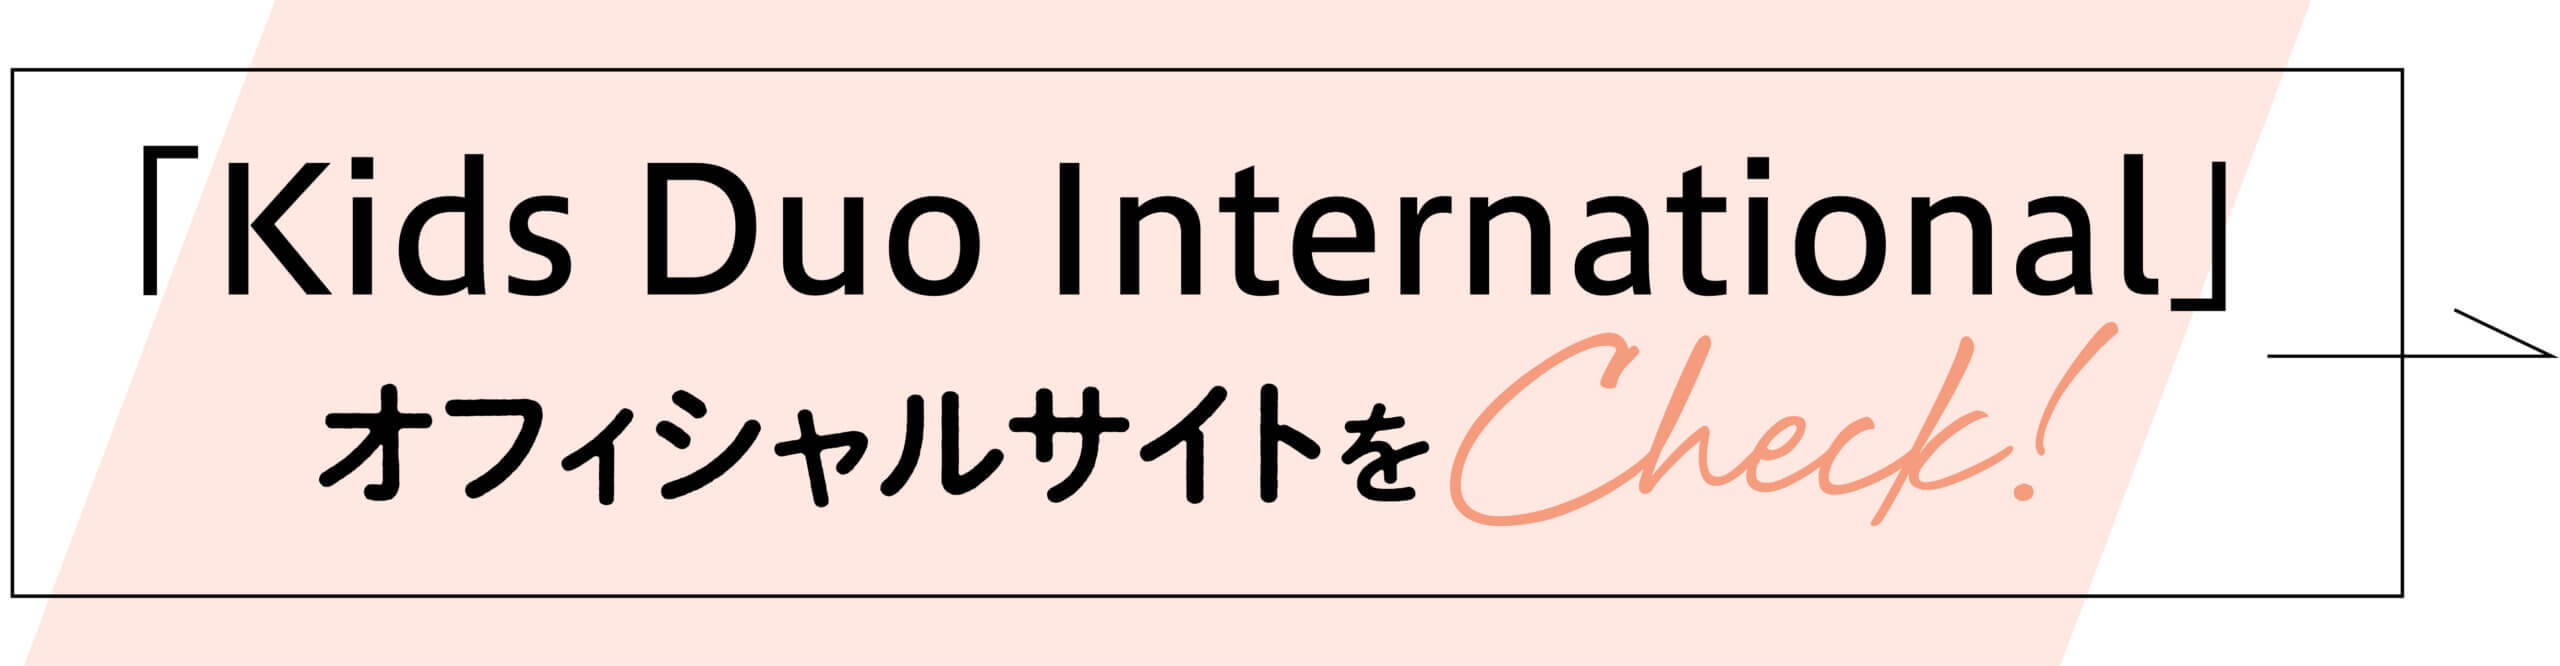 「Kids Duo International」 オフィシャルサイトをCheck!